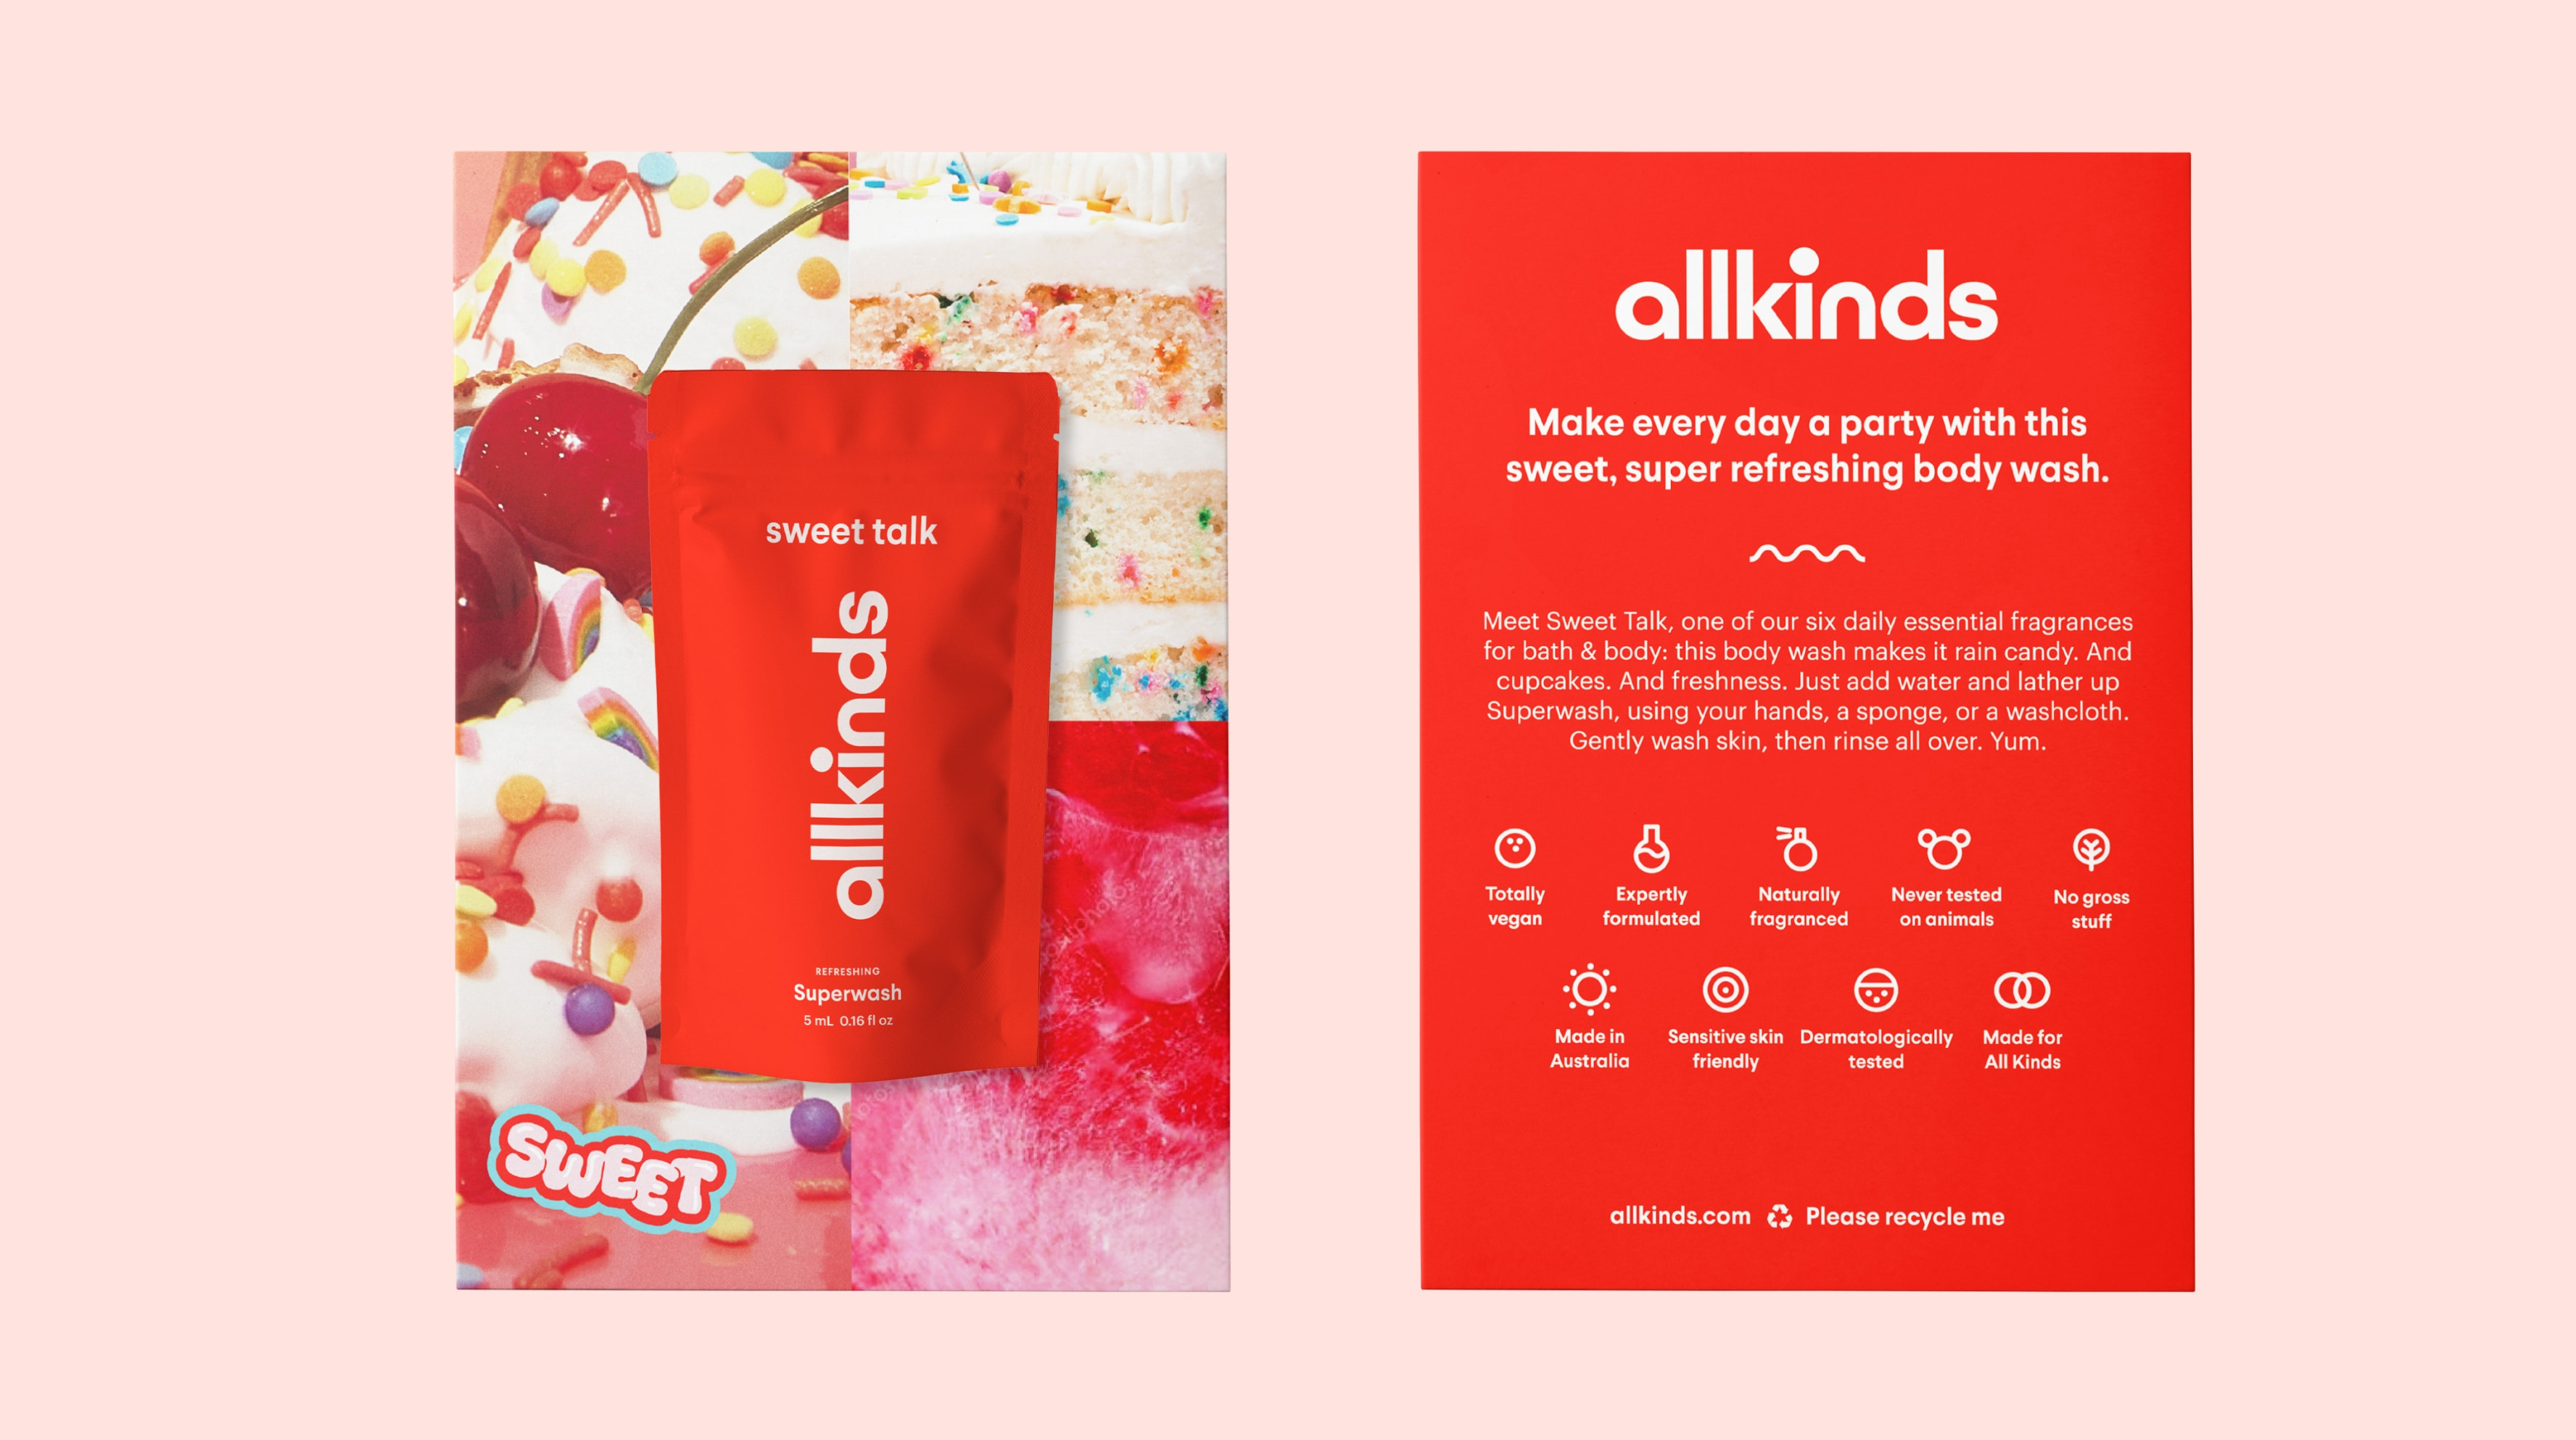 Allkinds Sweet Talk Superwash sample and sampling card packaging for retail distribution